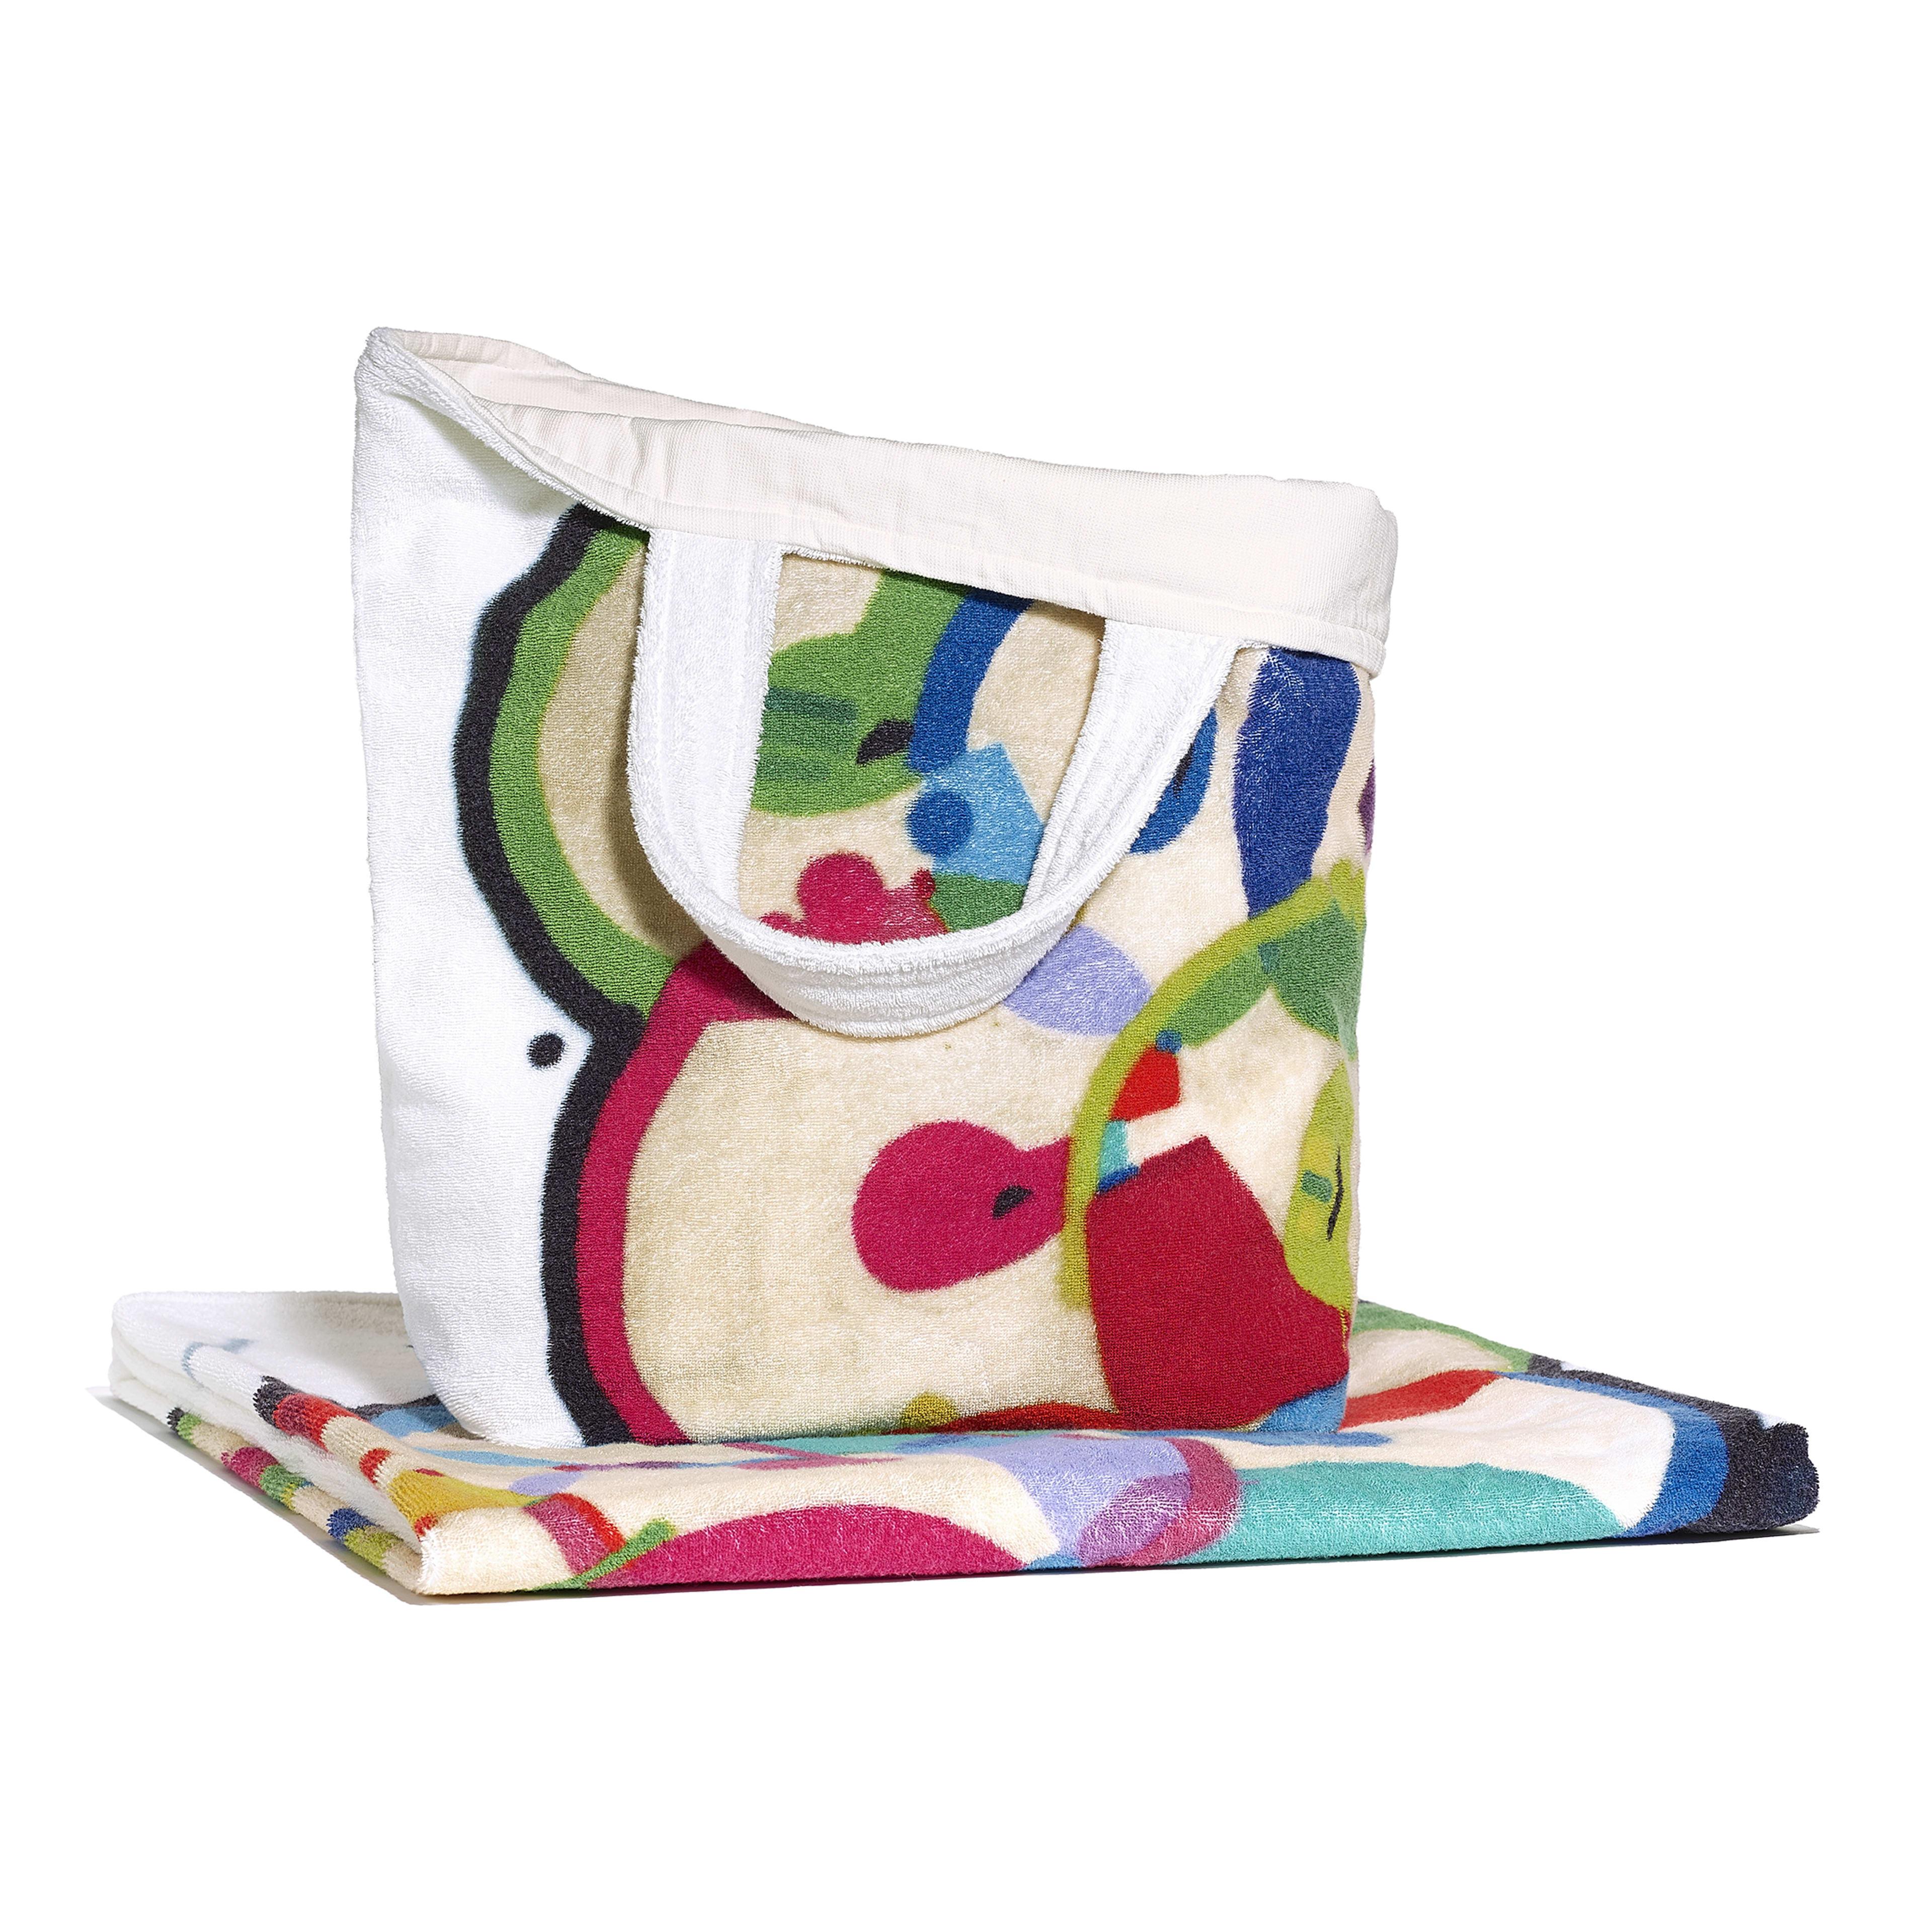 Beachwear Set - Ivory & Multicolour - Cotton - Alternative view - see full sized version